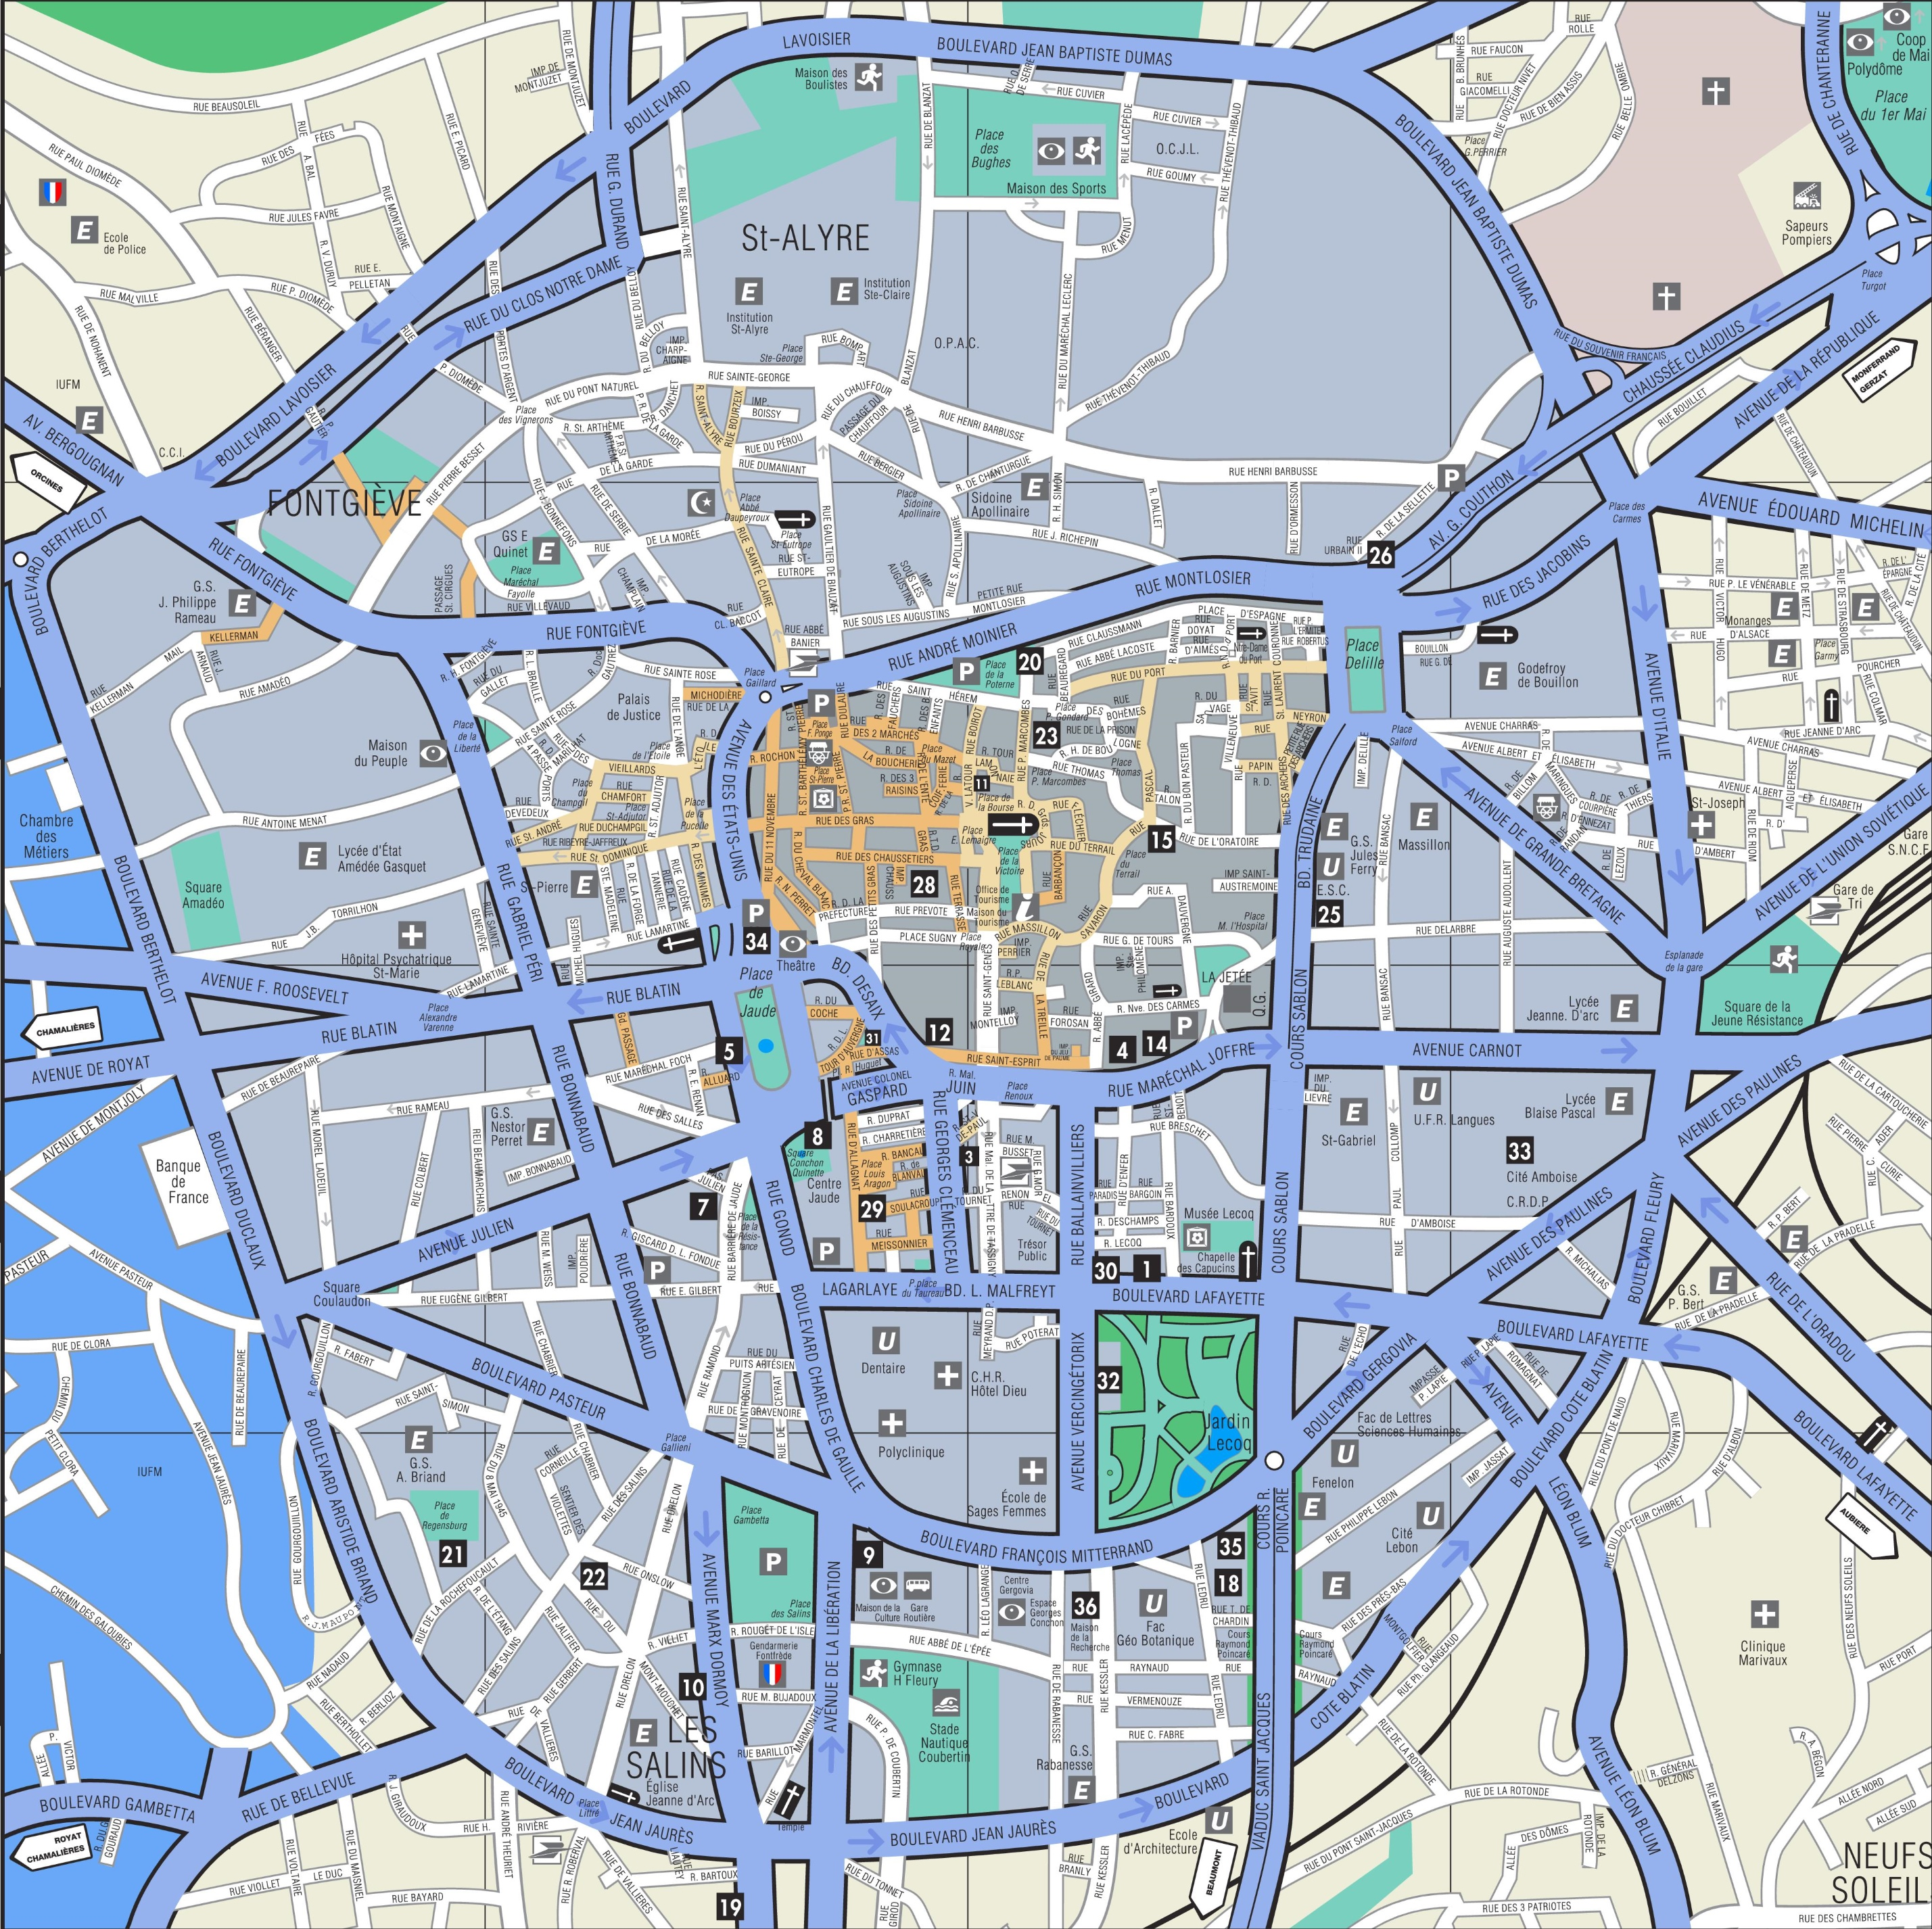 Clermont Ferrand city center map